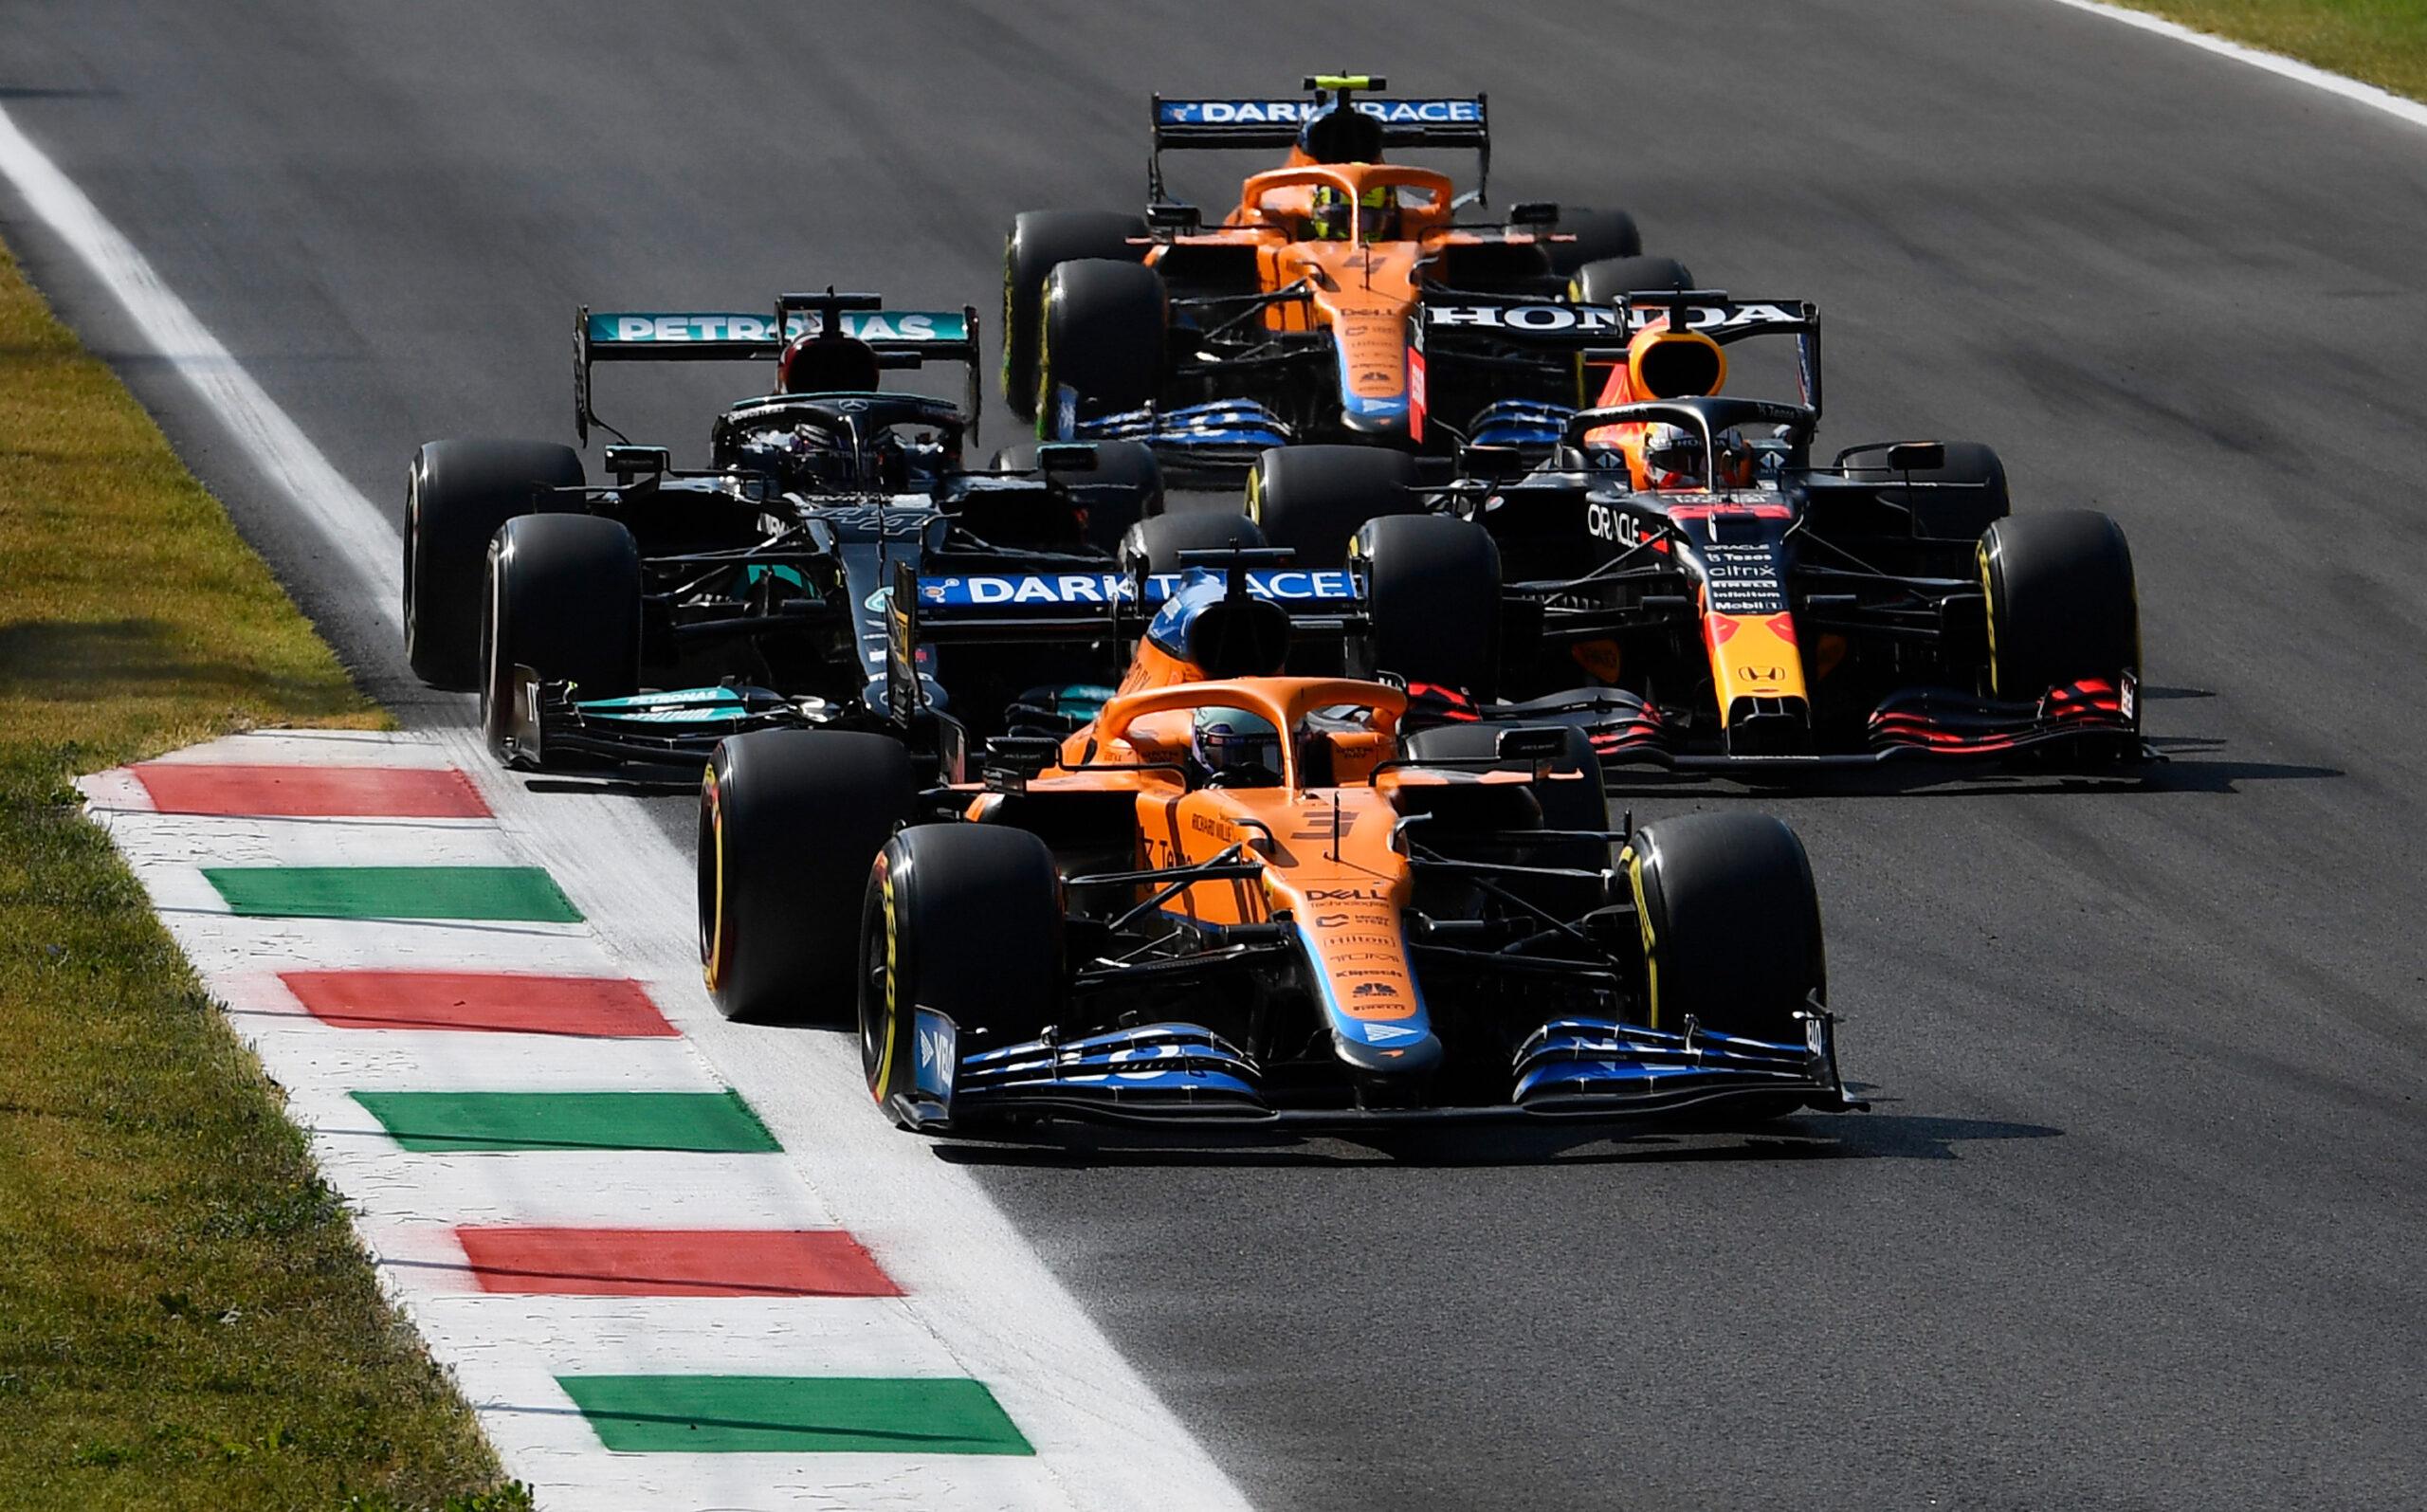 GP Włoch 2021